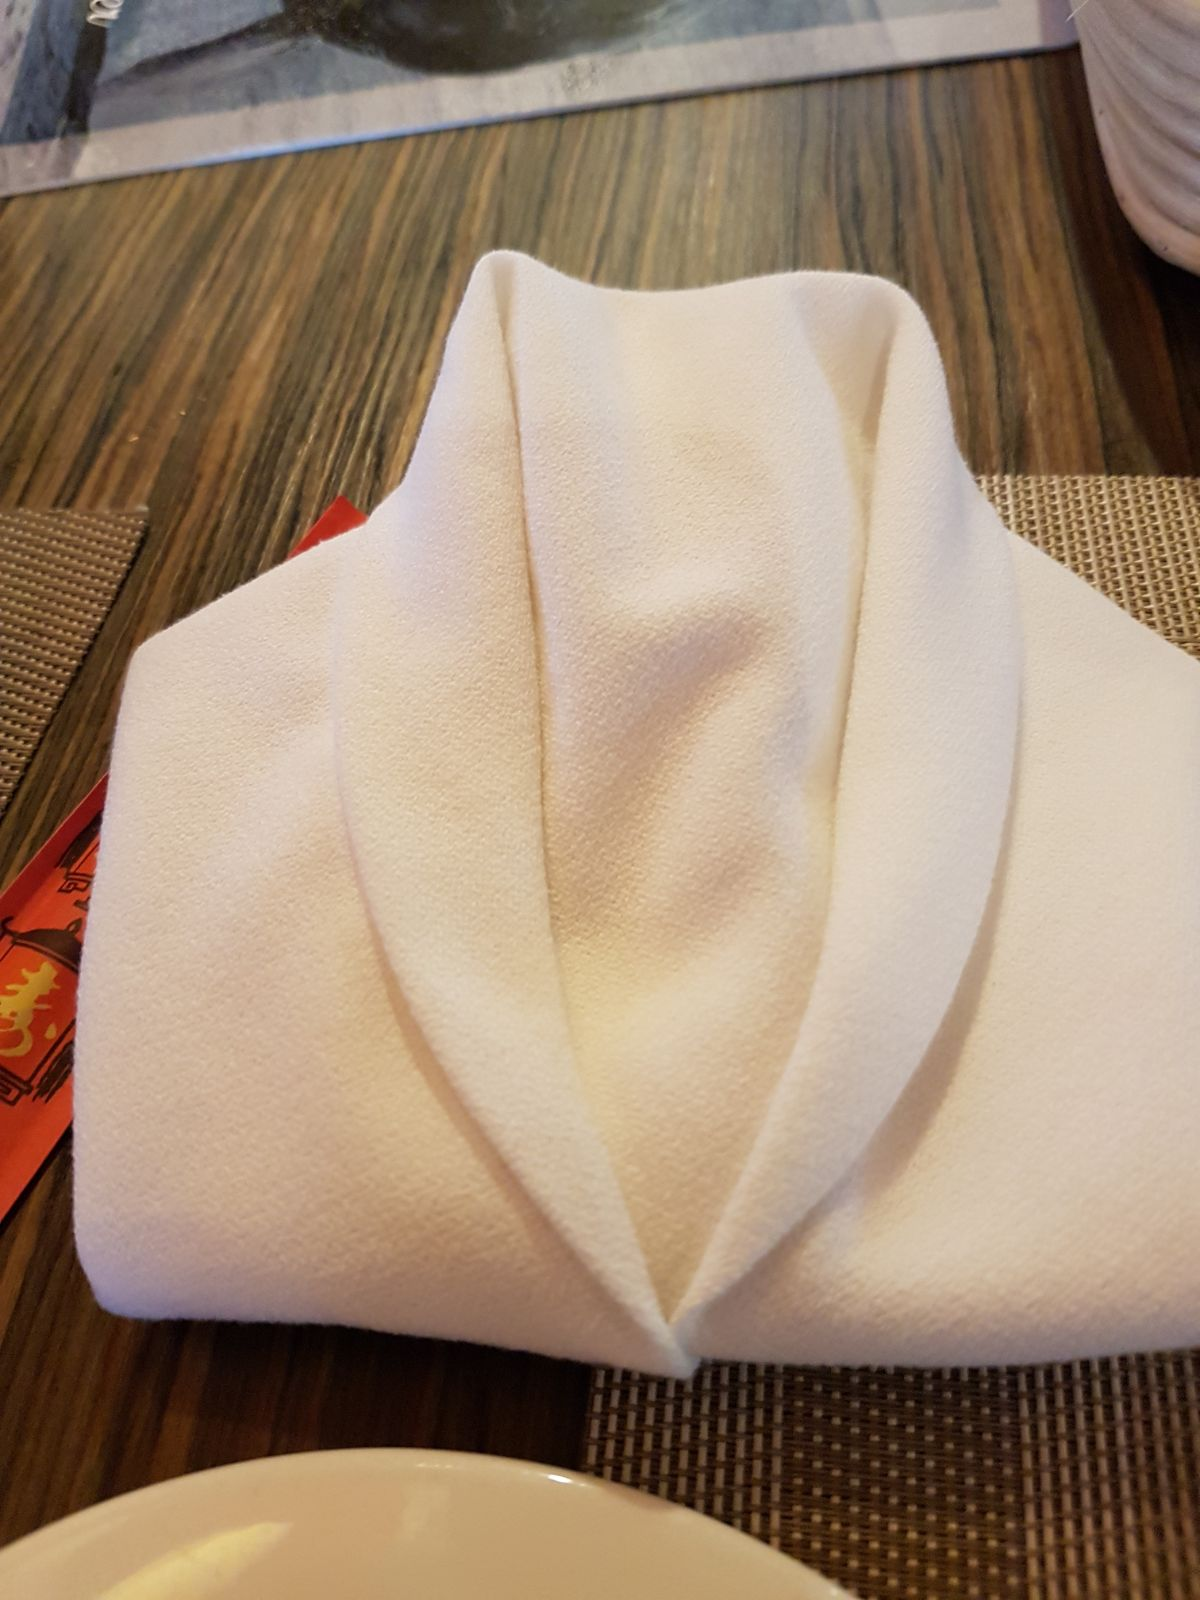 Tuxedo napkin.jpeg